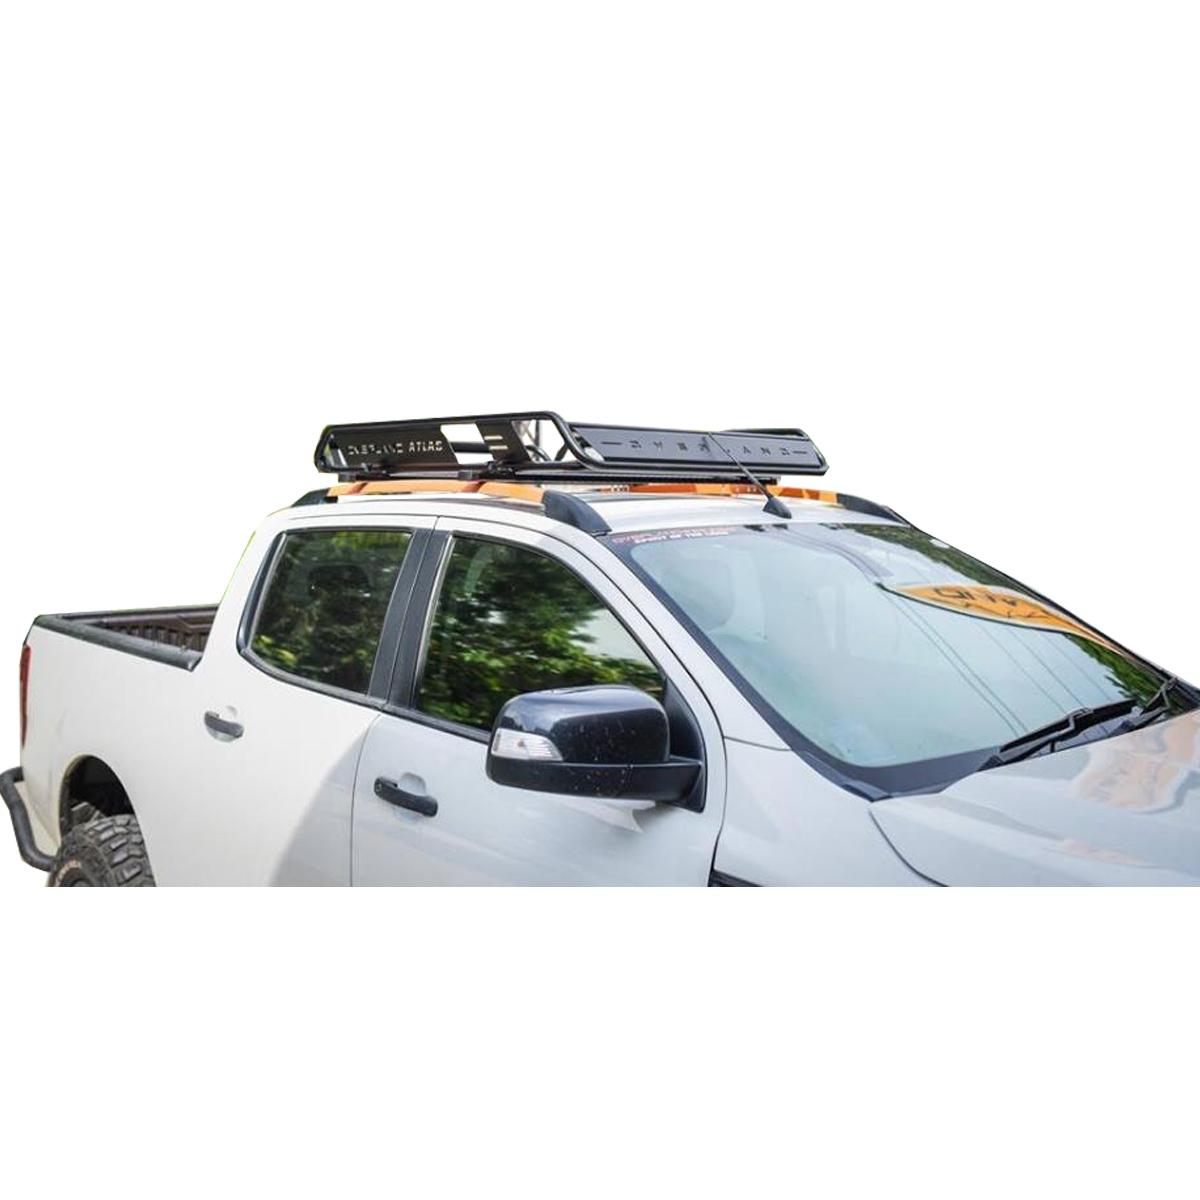 new atlas series roof rack tragersystem fur vw amarok 2010 bis 2016